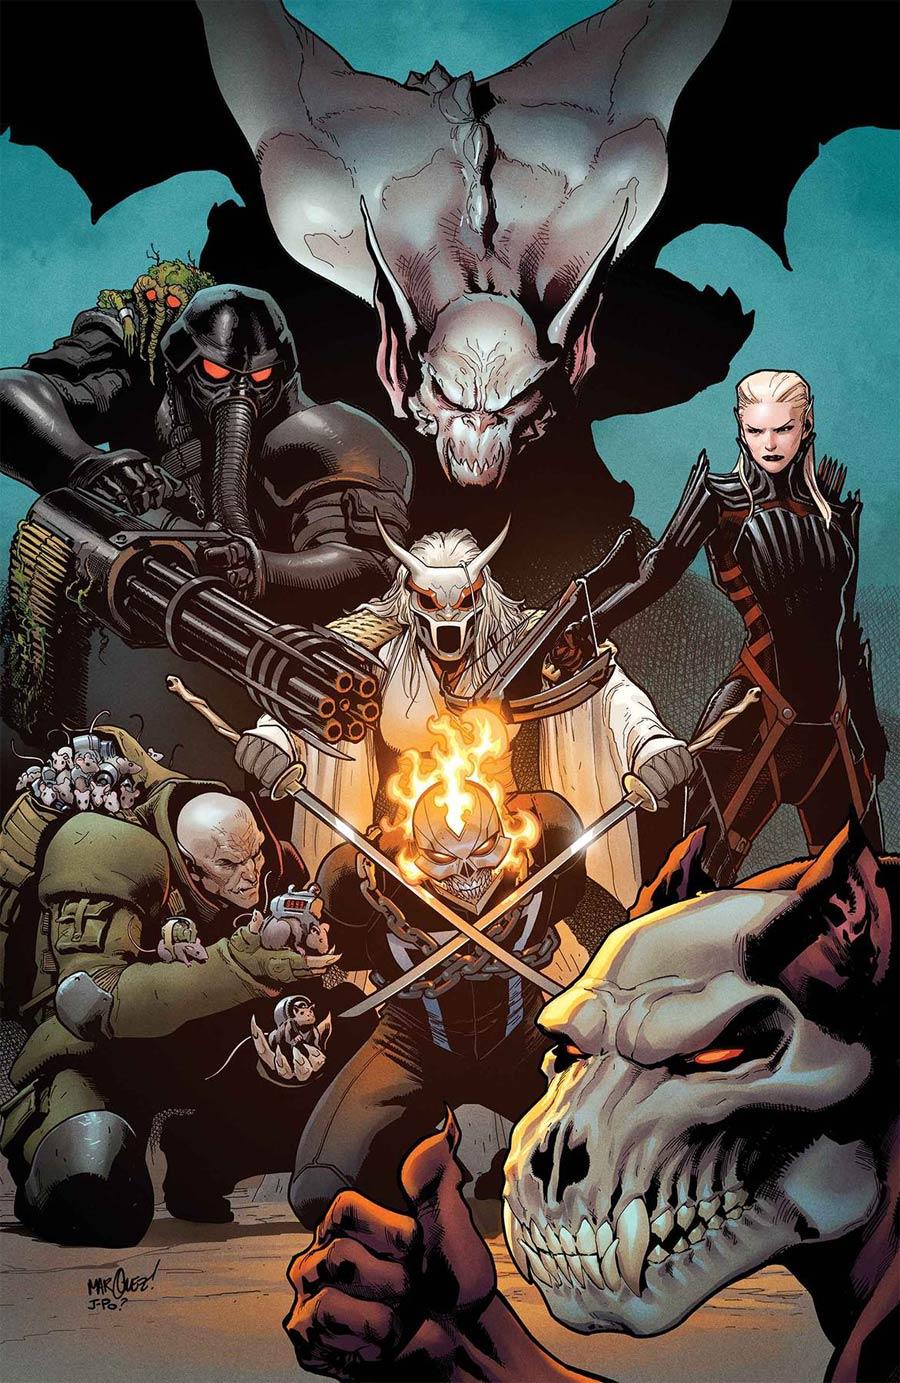 Avengers Vol 7 #15 Cover A Regular David Marquez Cover